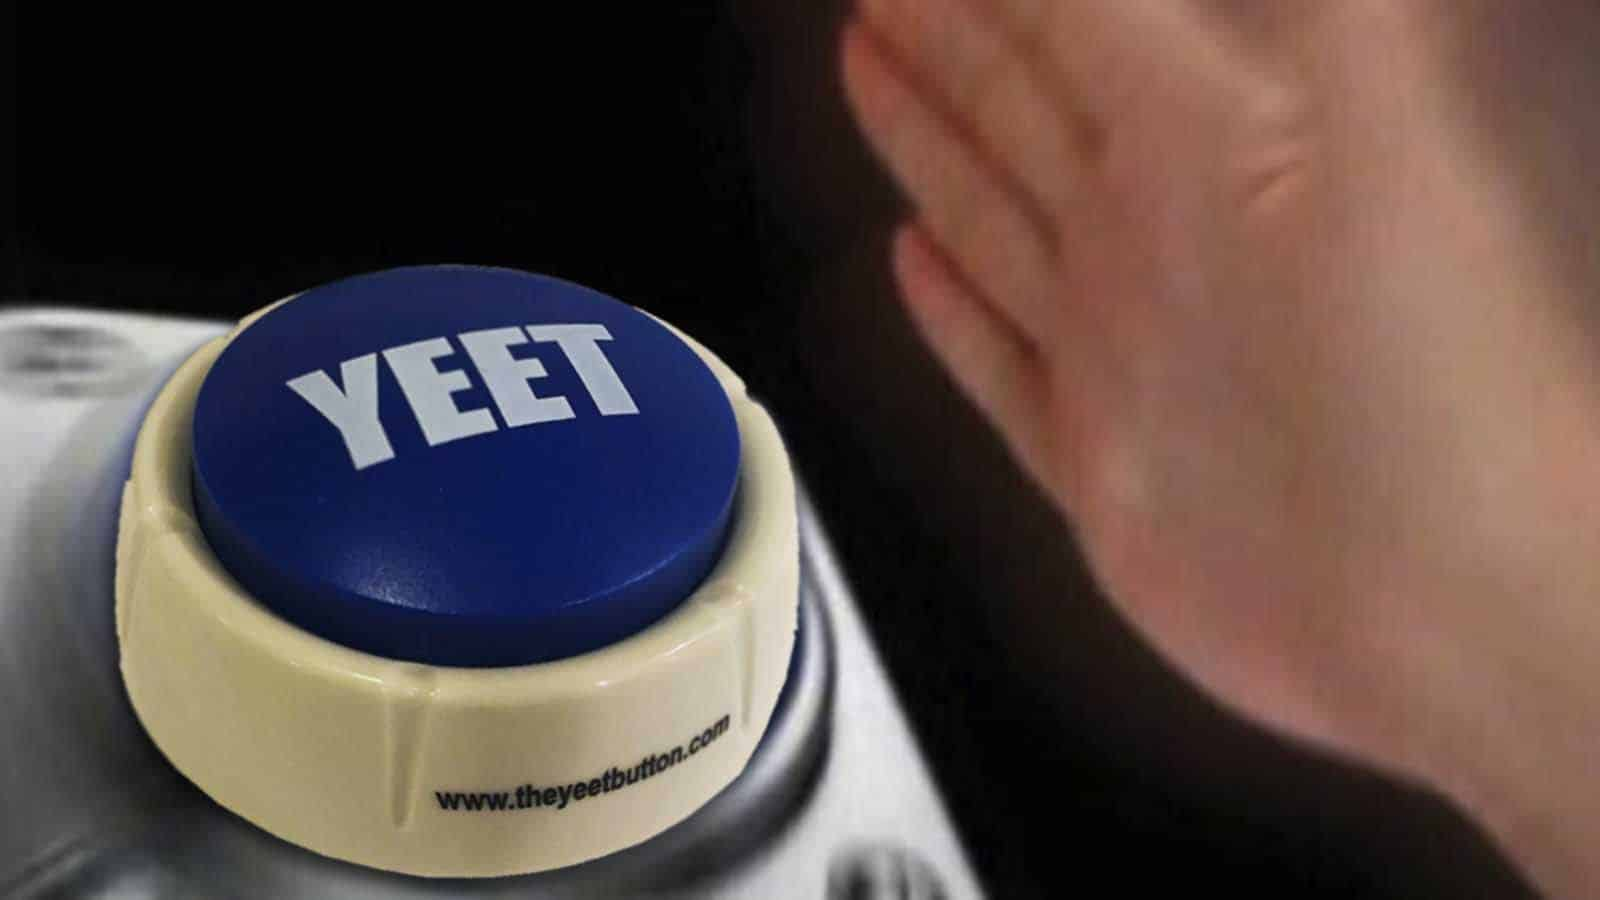 yeet meme button